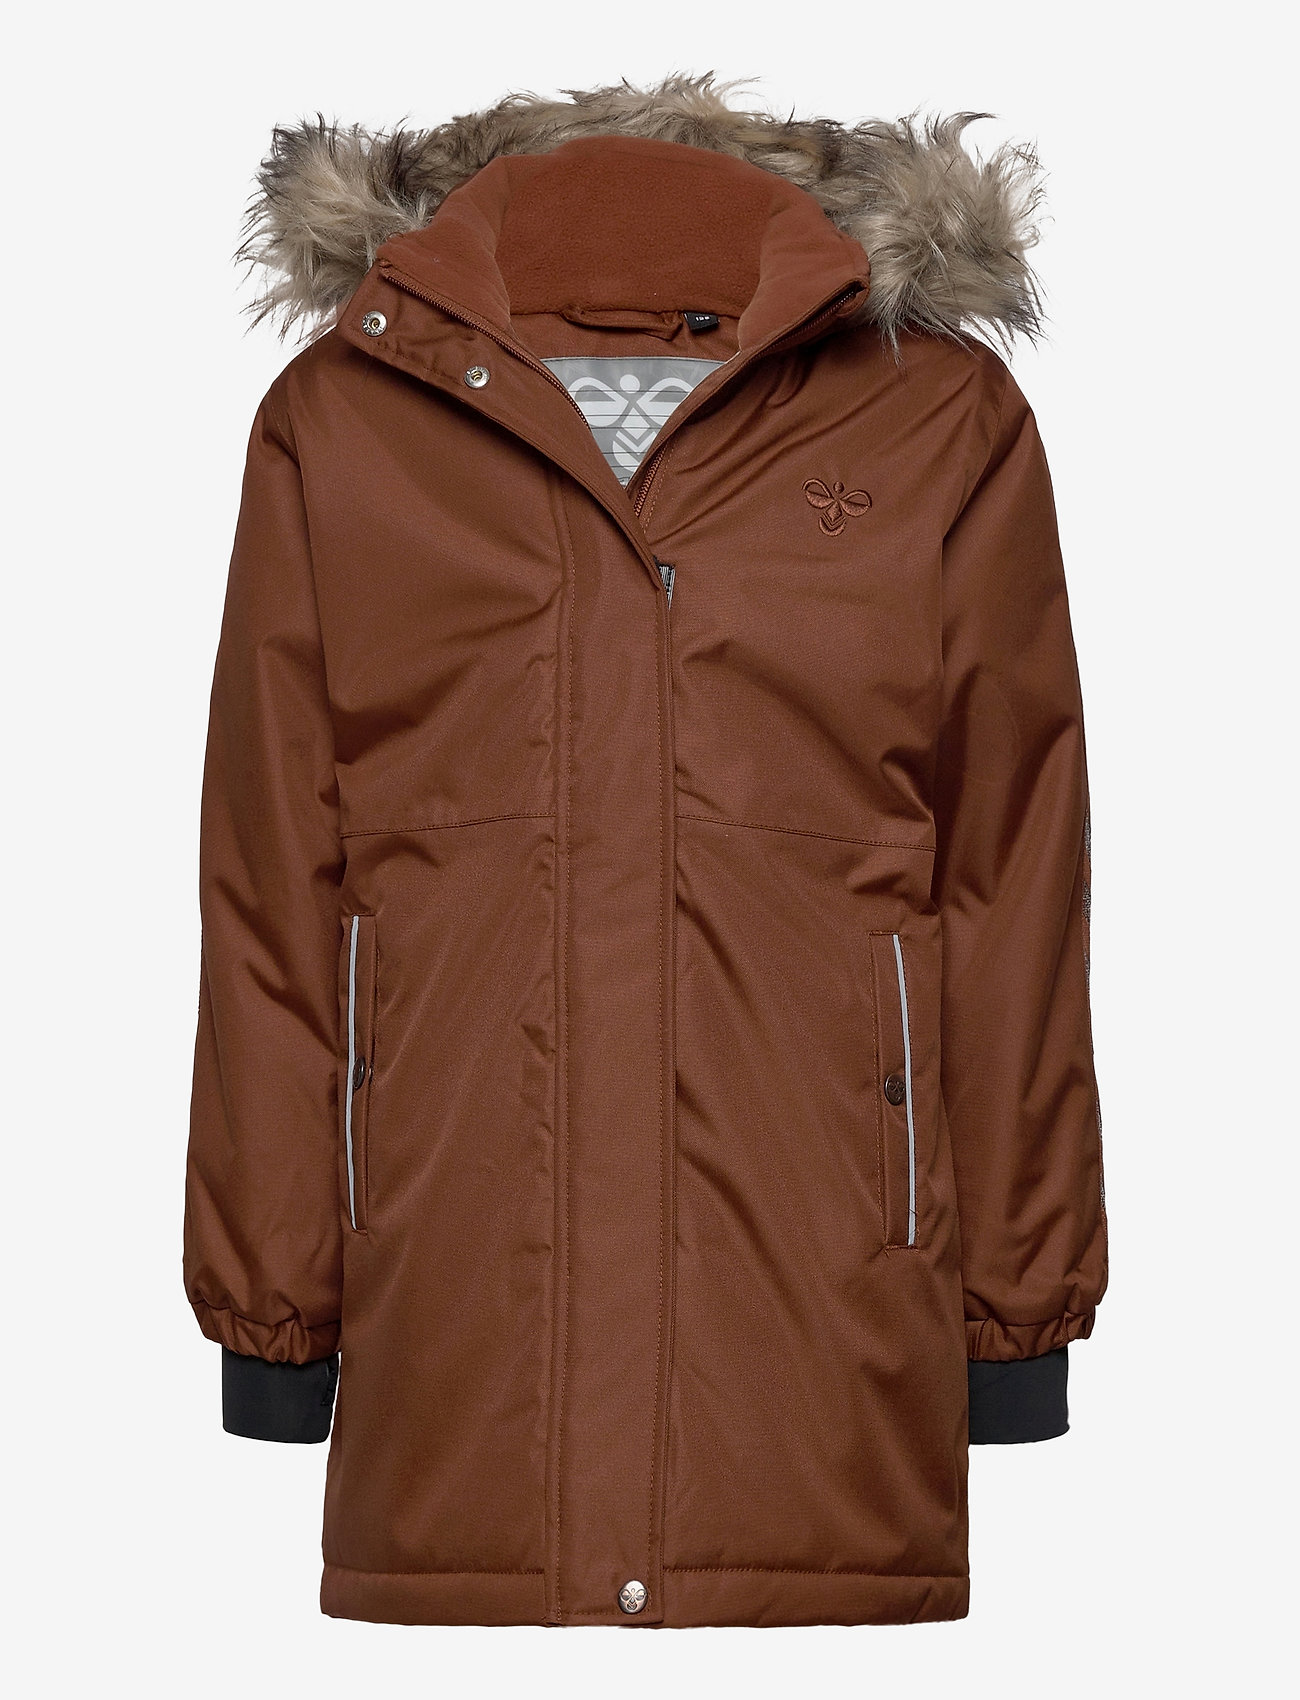 Hummel - hmlLEAF COAT - ski jackets - tortoise shell - 0